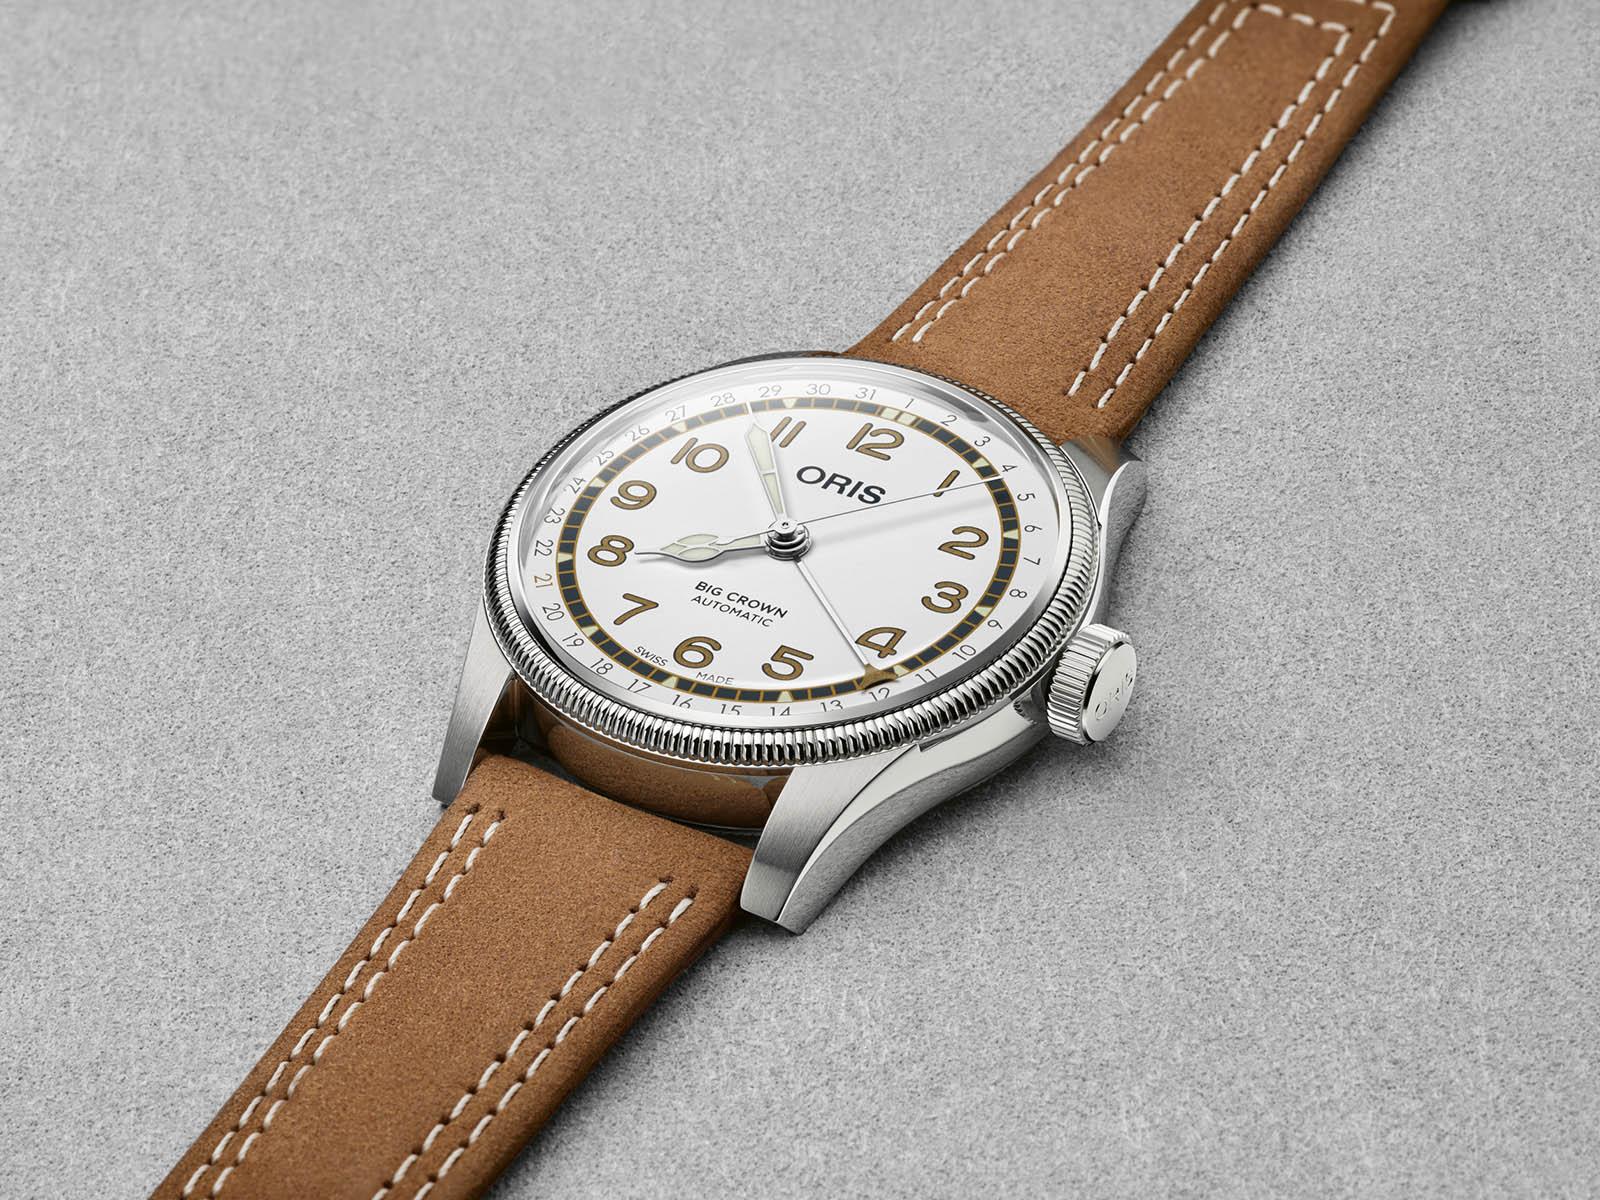 01-754-7741-4081-set-oris-roberto-clemente-limited-edition-1.jpg